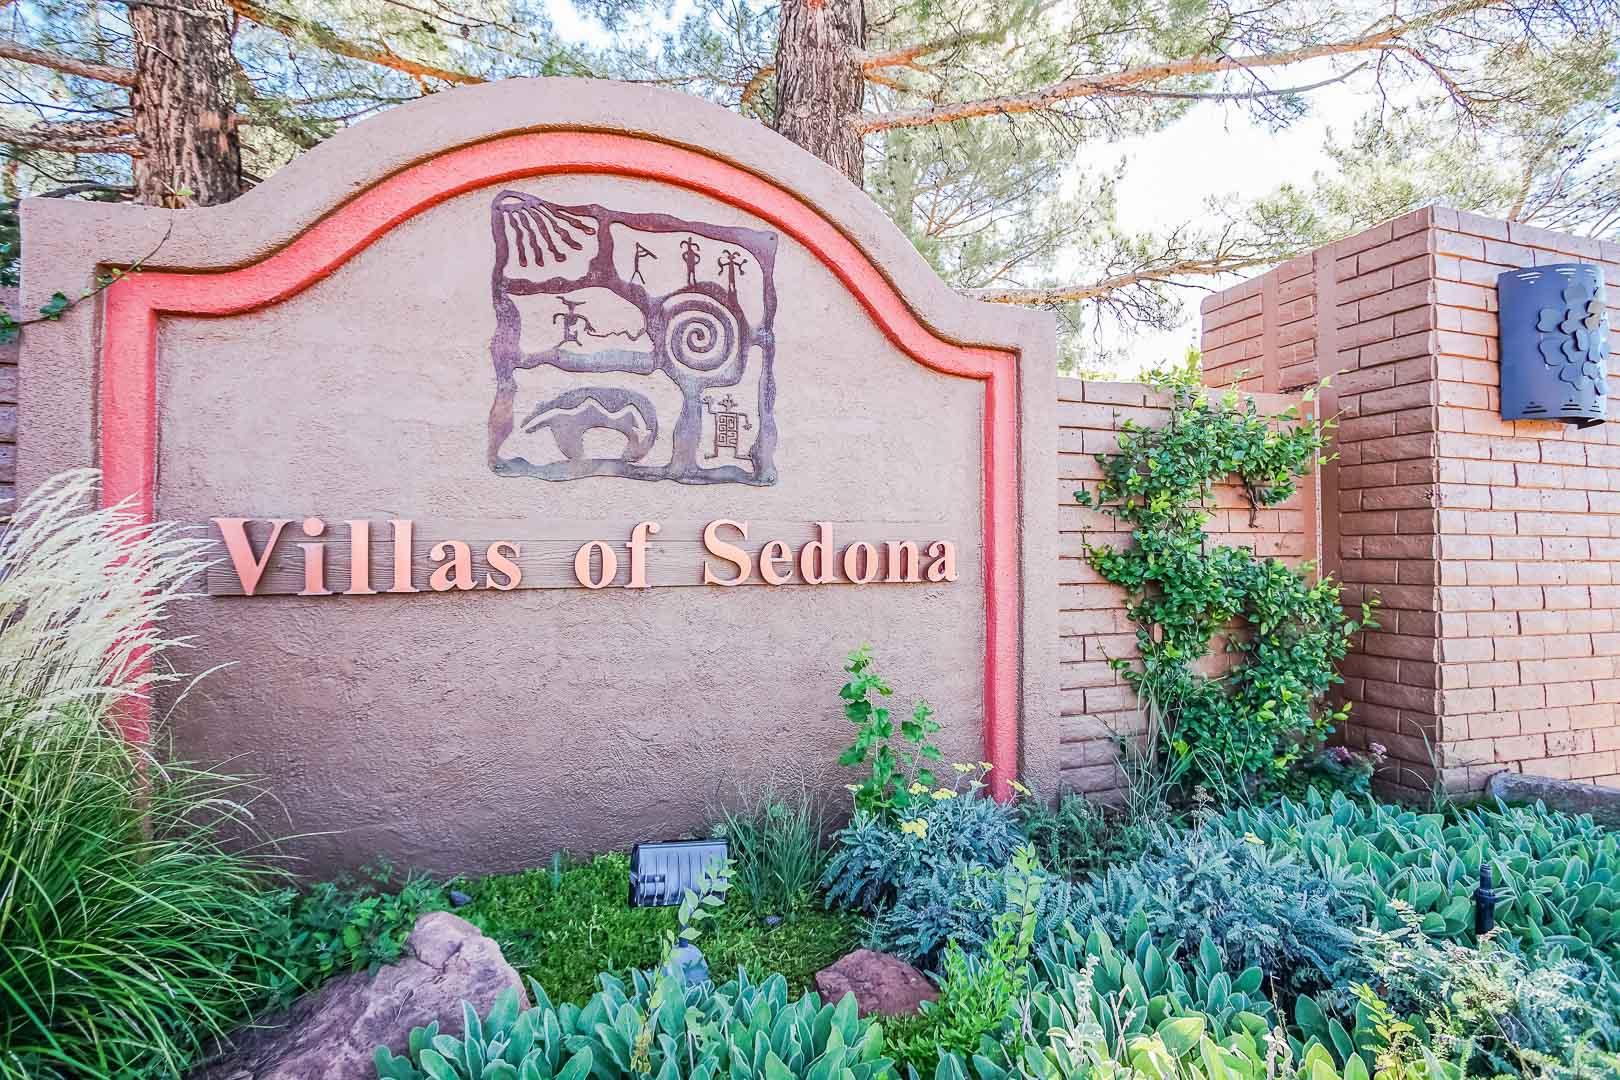 Villas-of-sedona-01